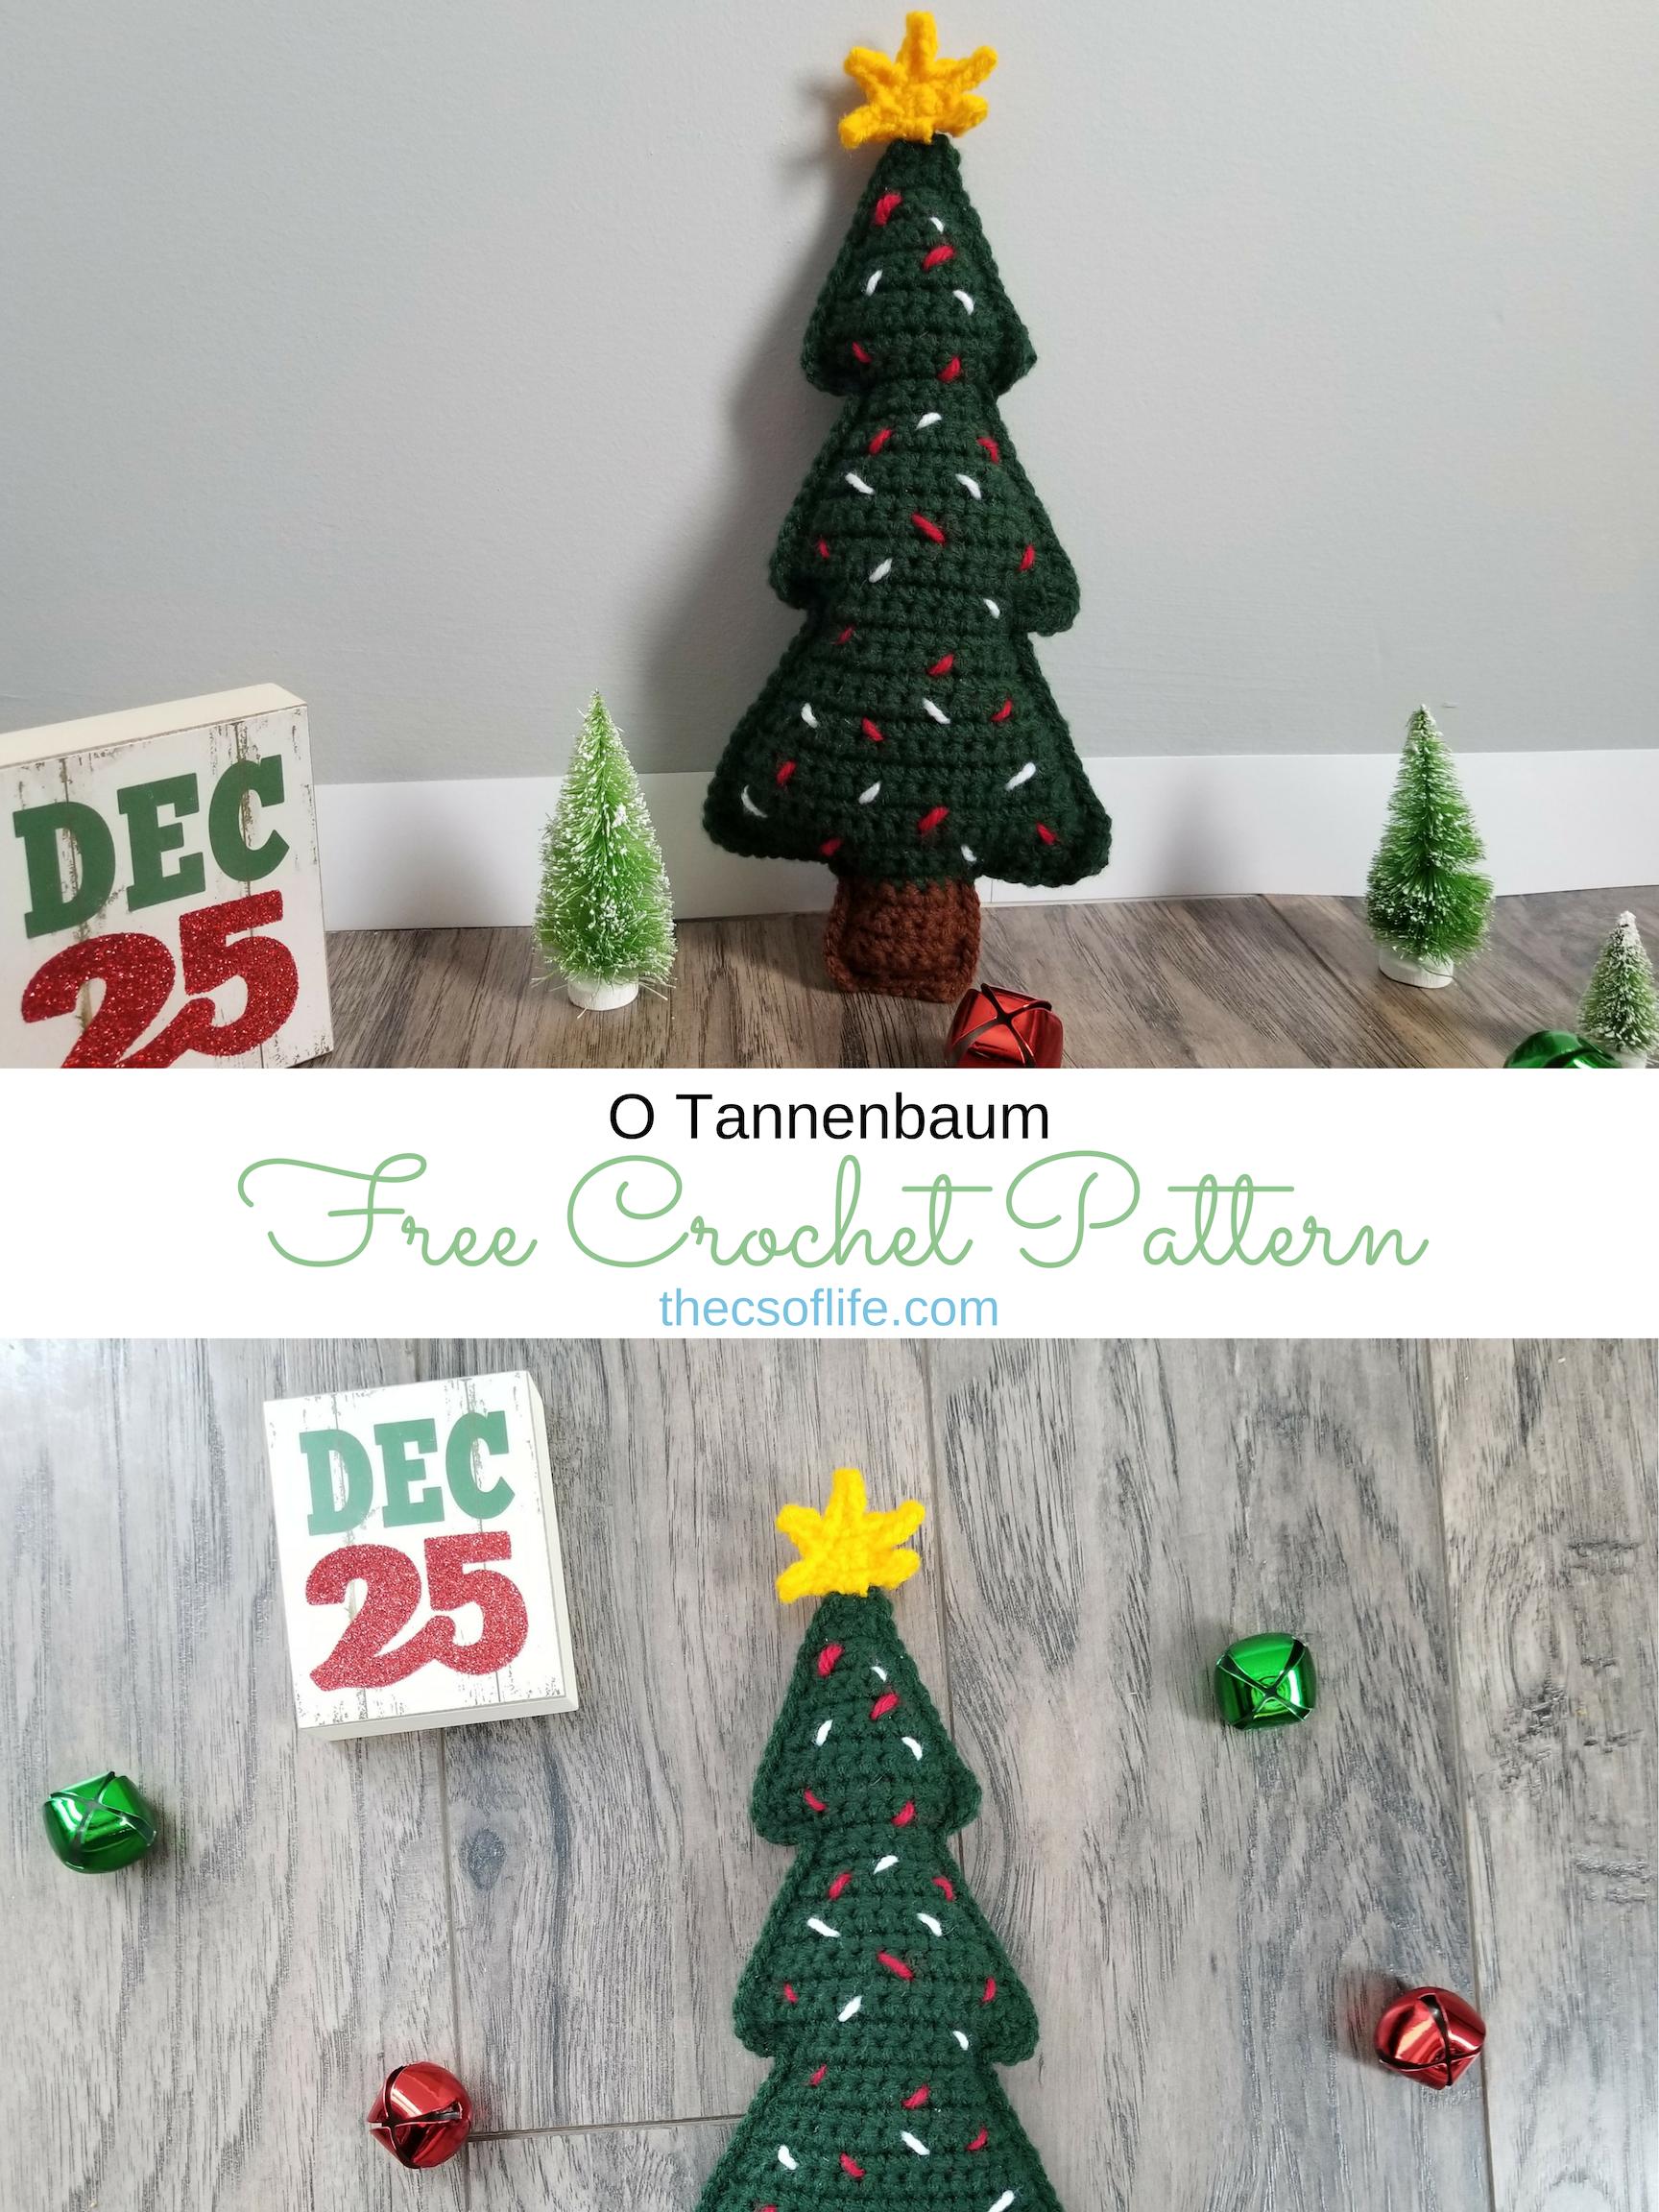 O Tannenbaum - Free Crochet Pattern